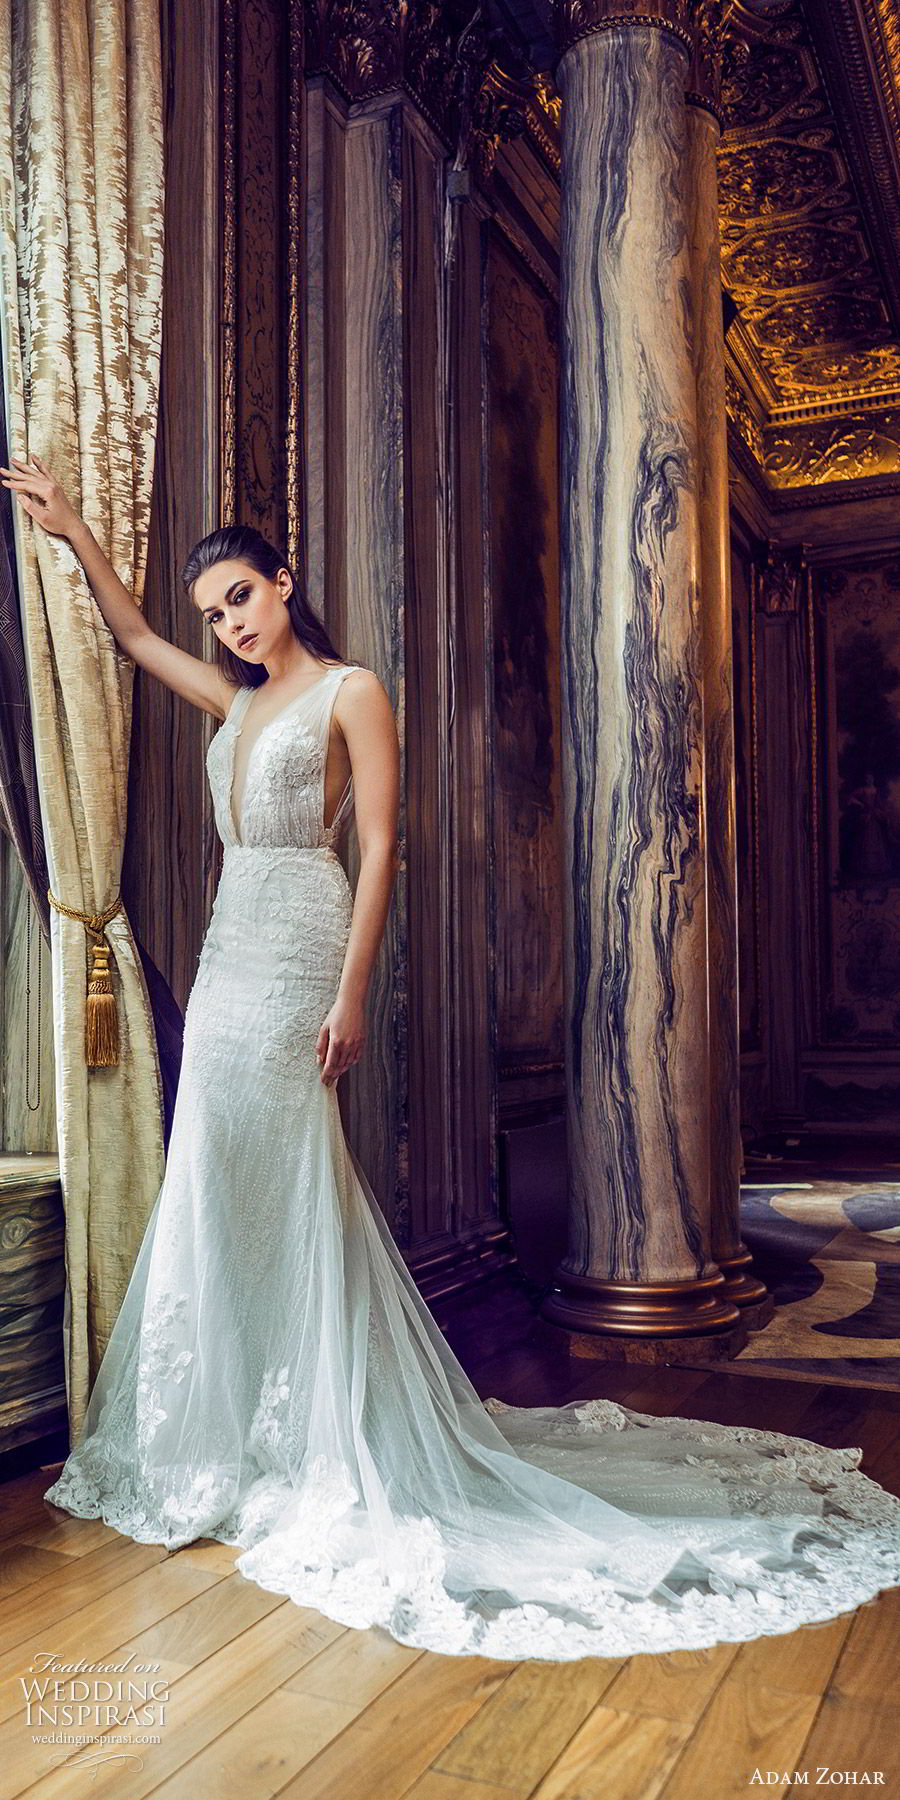 adam zohar 2020 bridal sleeveless ruched straps deep v neckline fully embellished lace mermaid sheath fit flare wedding dress (13) elegant glitzy glam chapel train mv